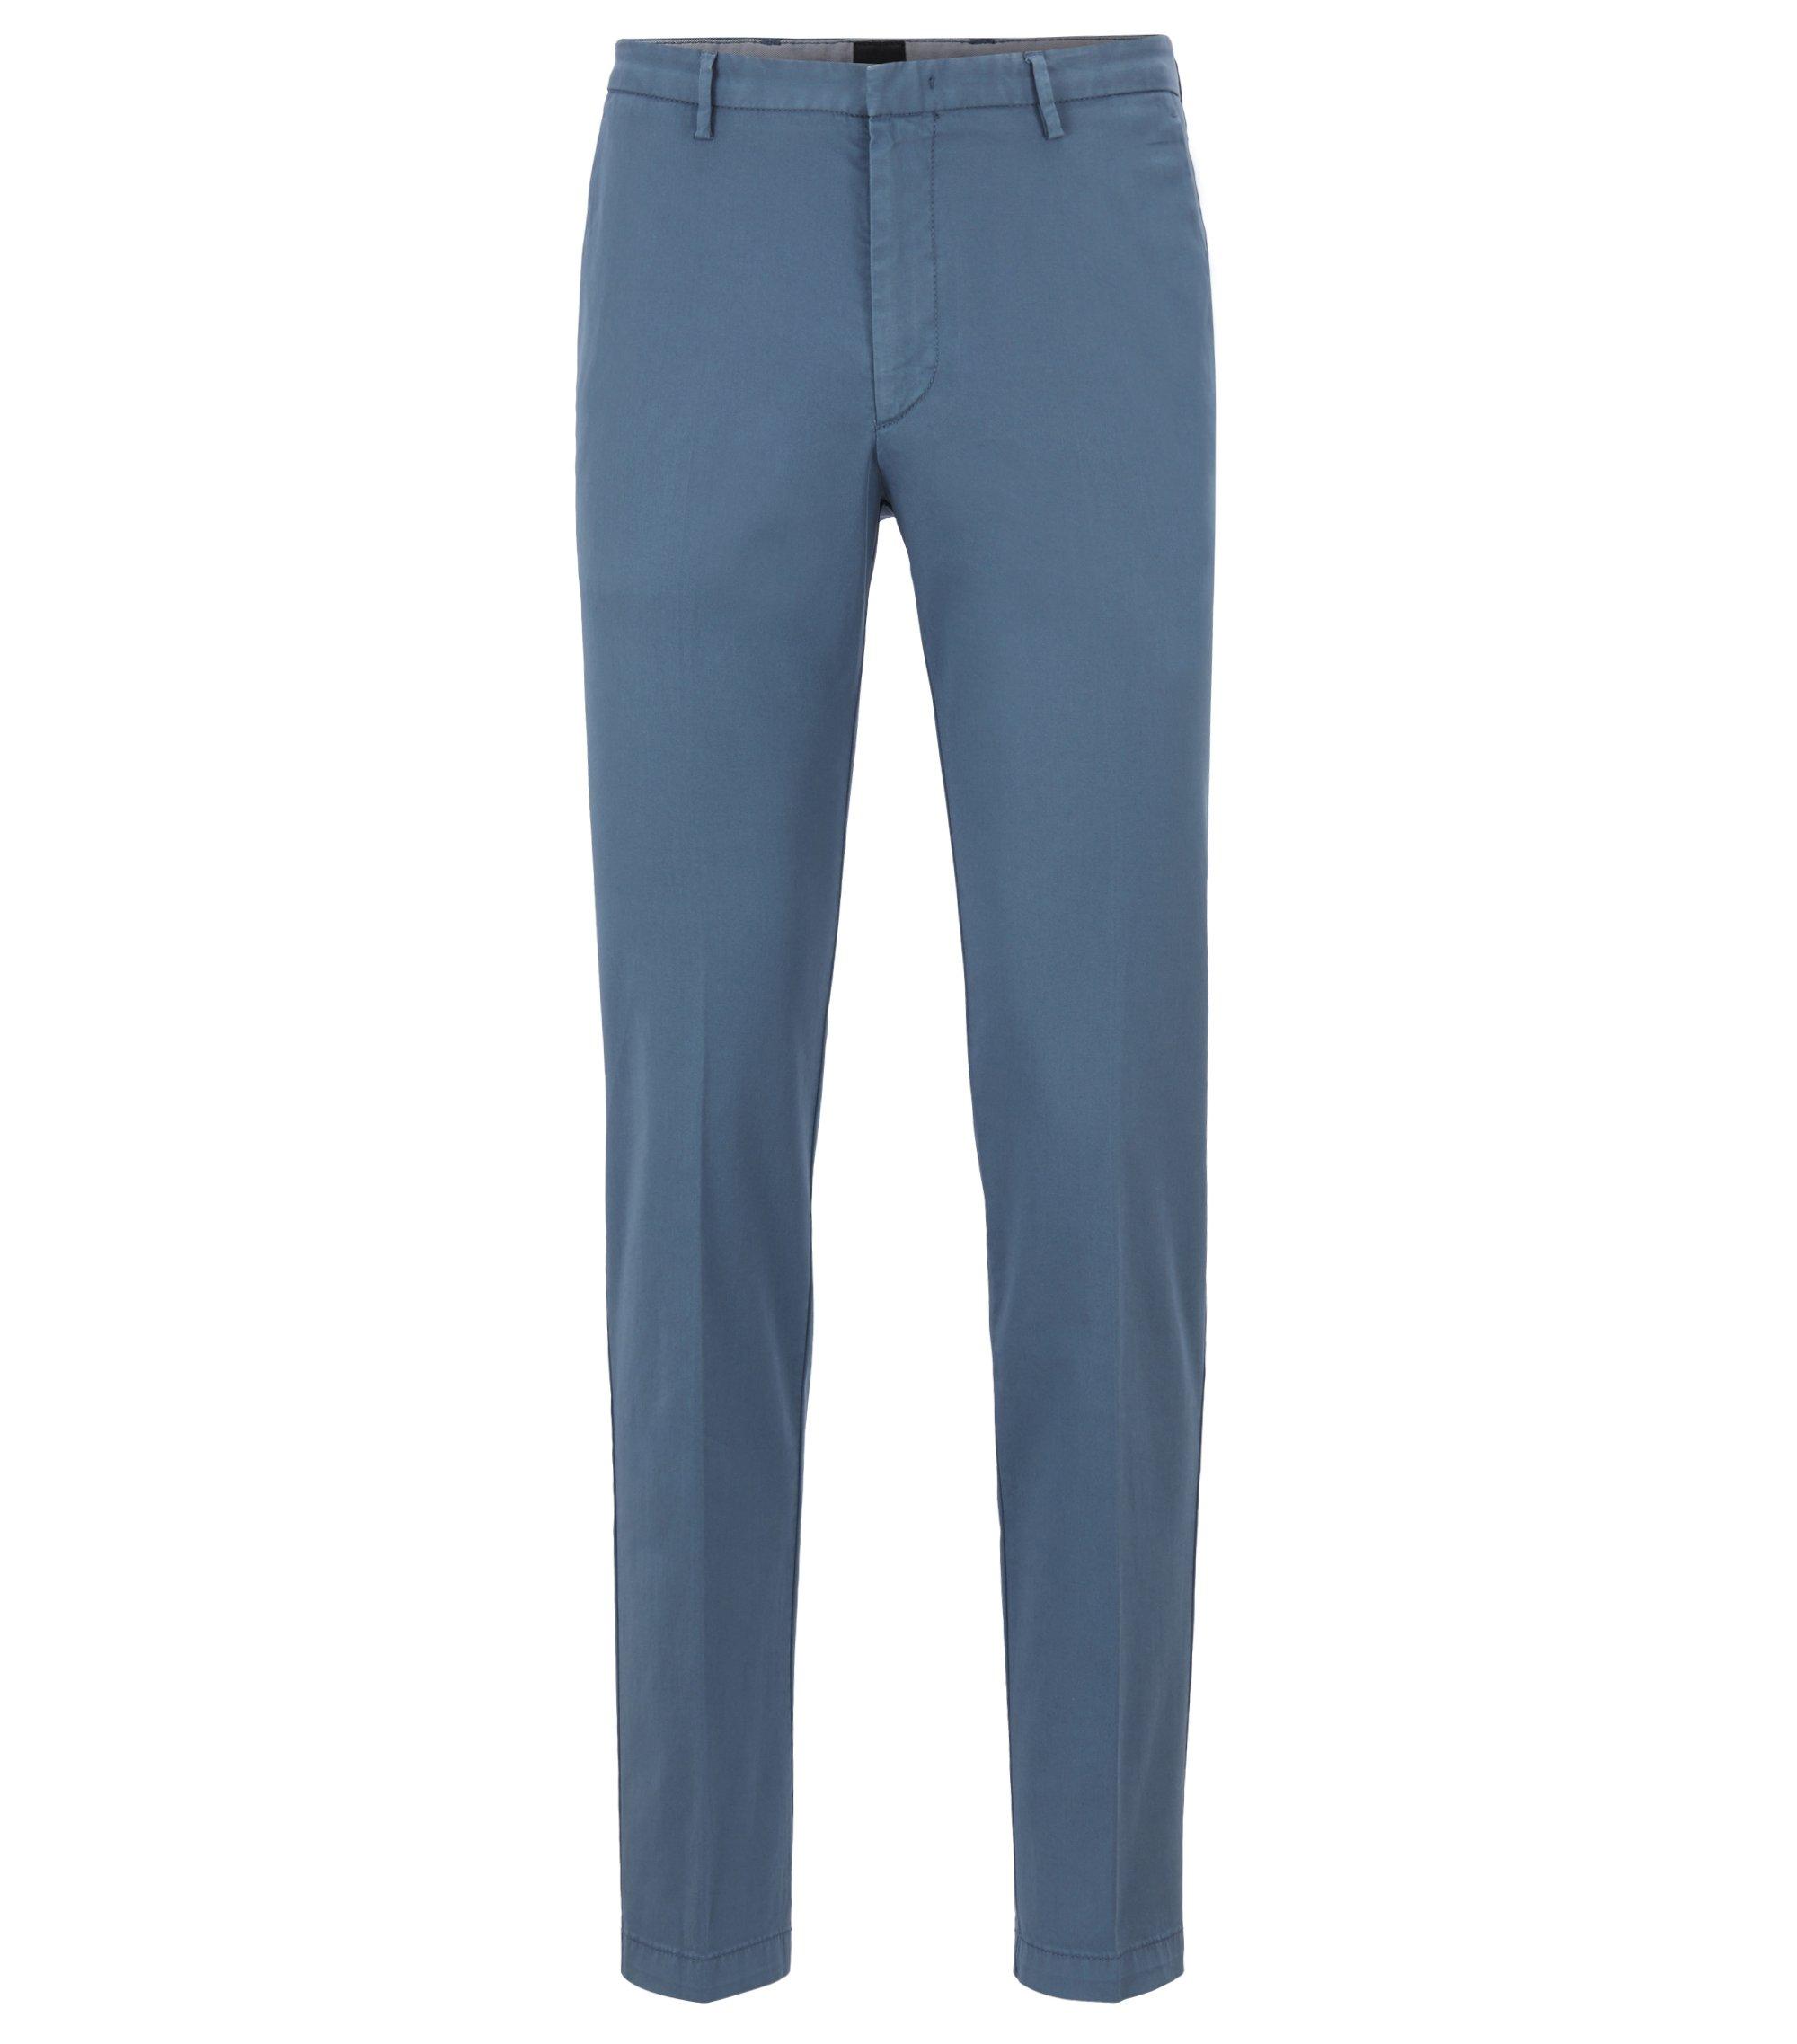 Chino Slim Fit en gabardine de coton stretch, Bleu